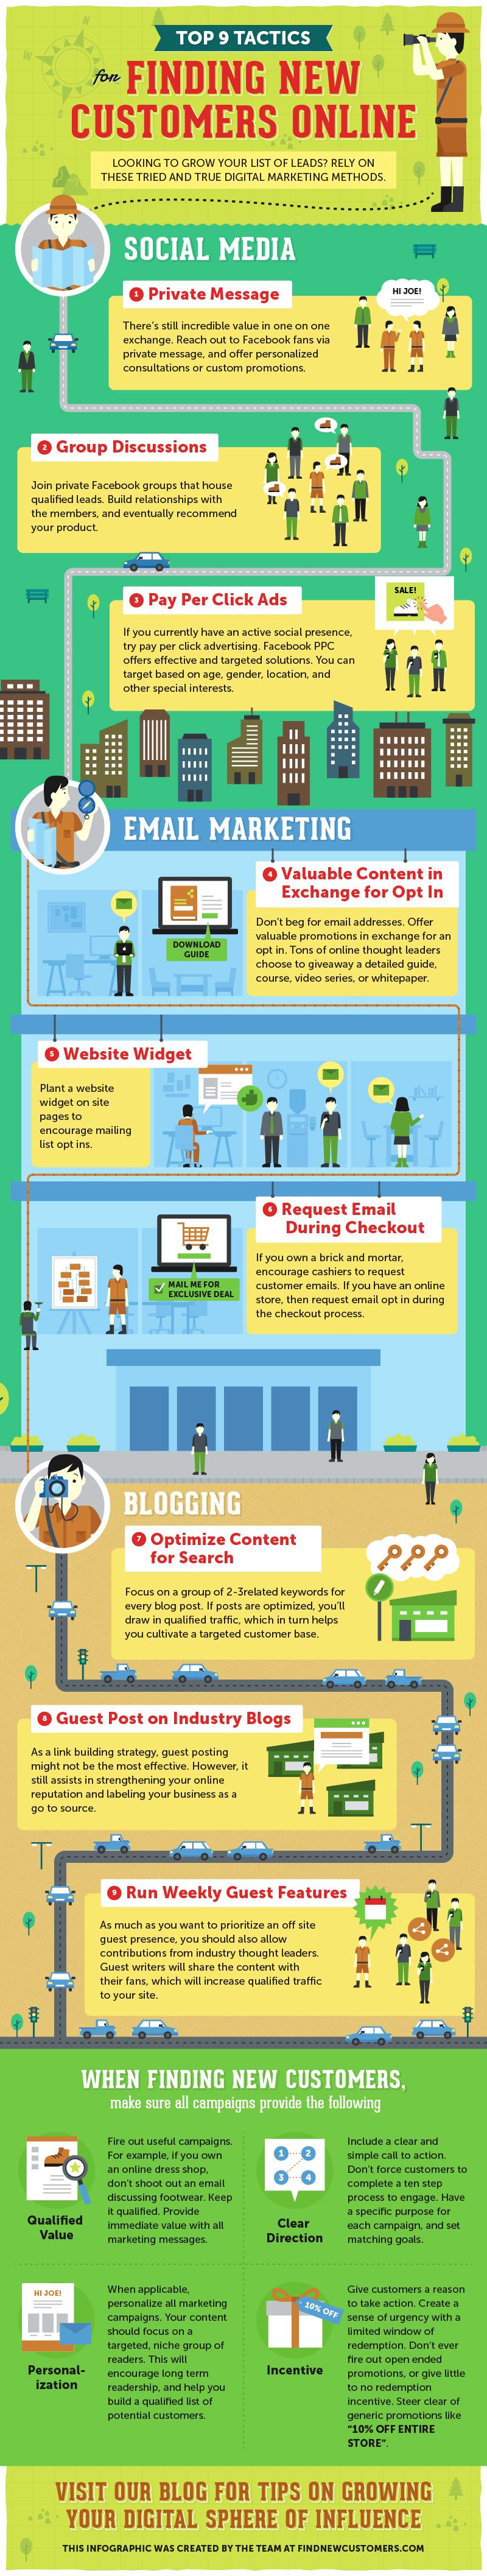 9 Essential Tactics to Generate Website Traffic and Inquiries [Infographic]